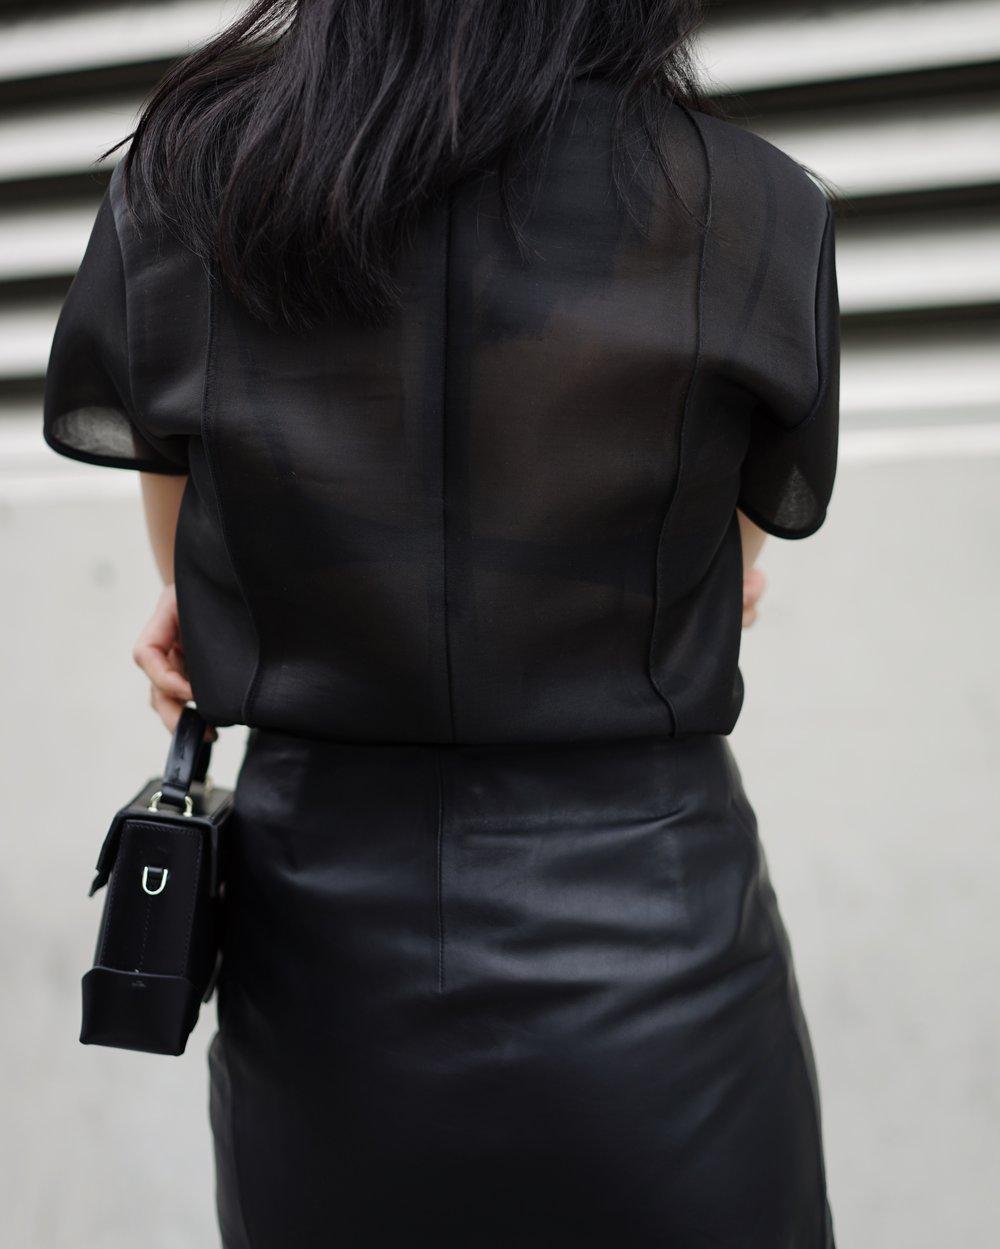 AH_leather.JPG